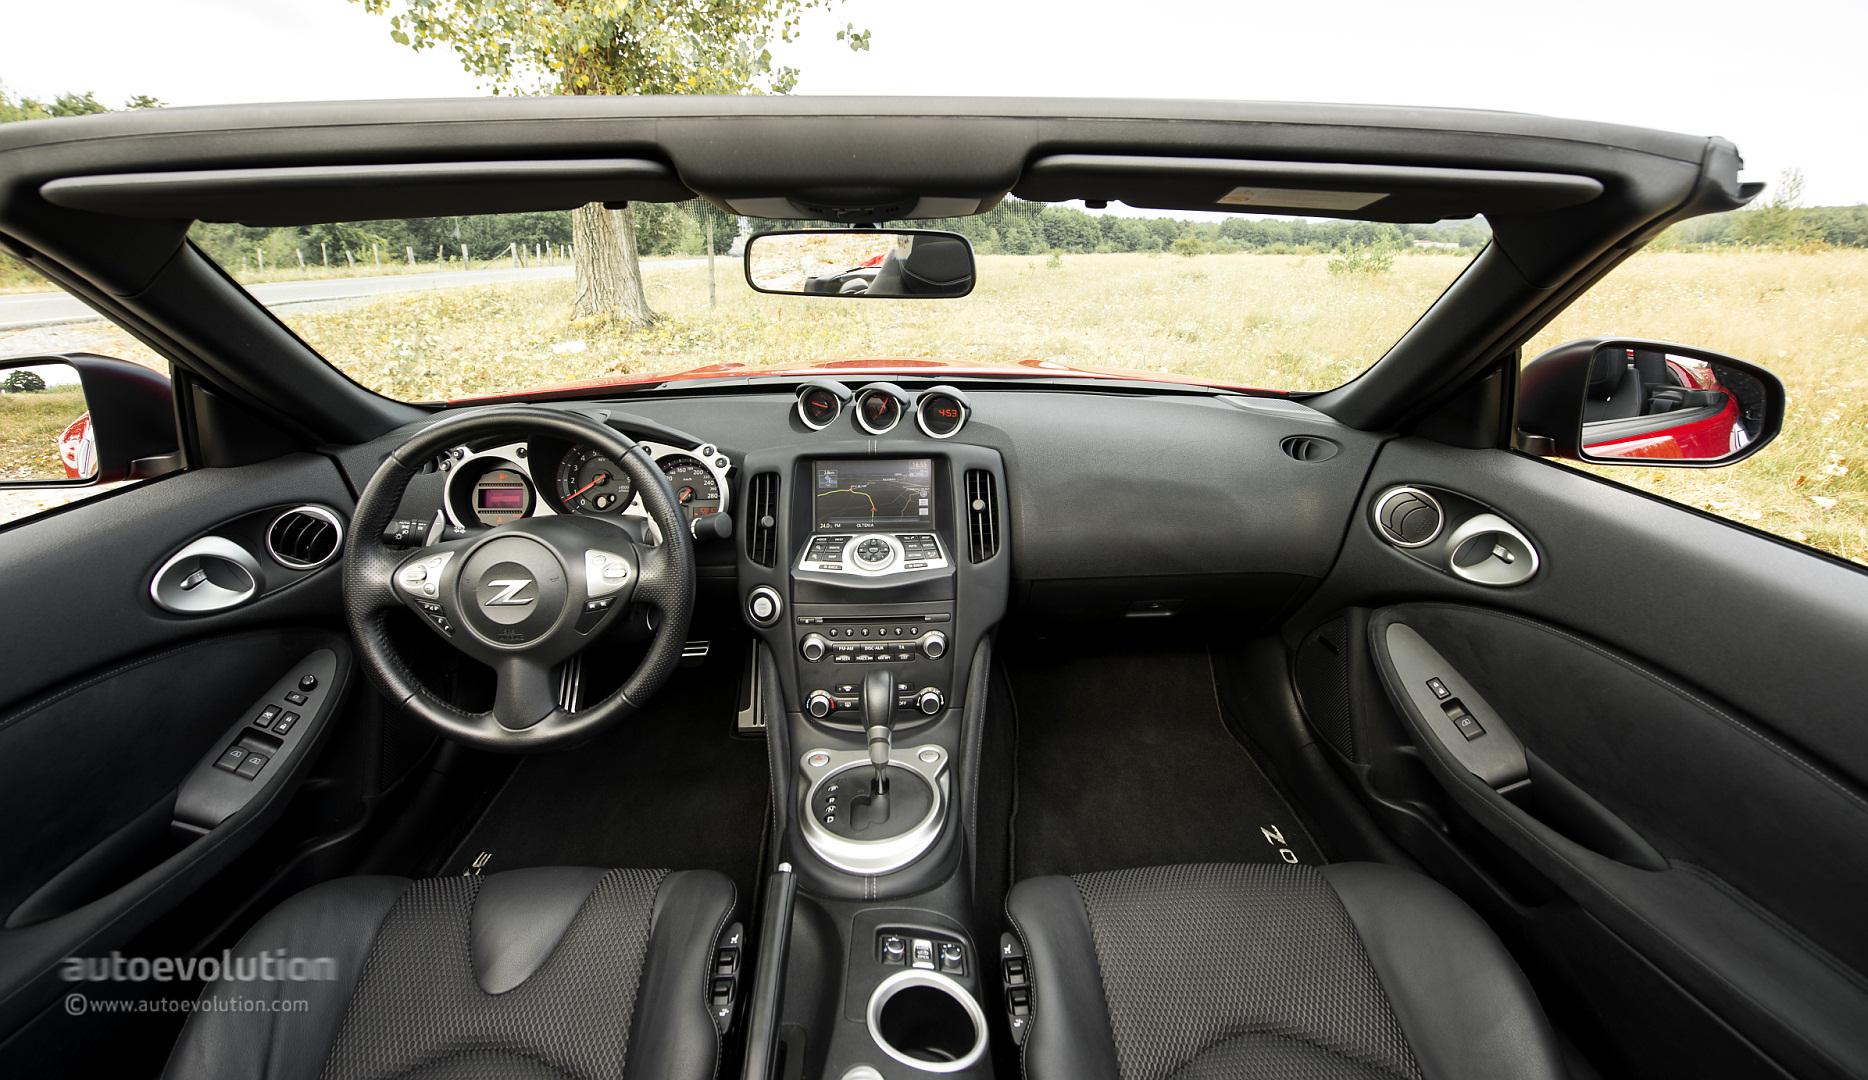 2014 Nissan 370Z Roadster Original Pictures - autoevolution